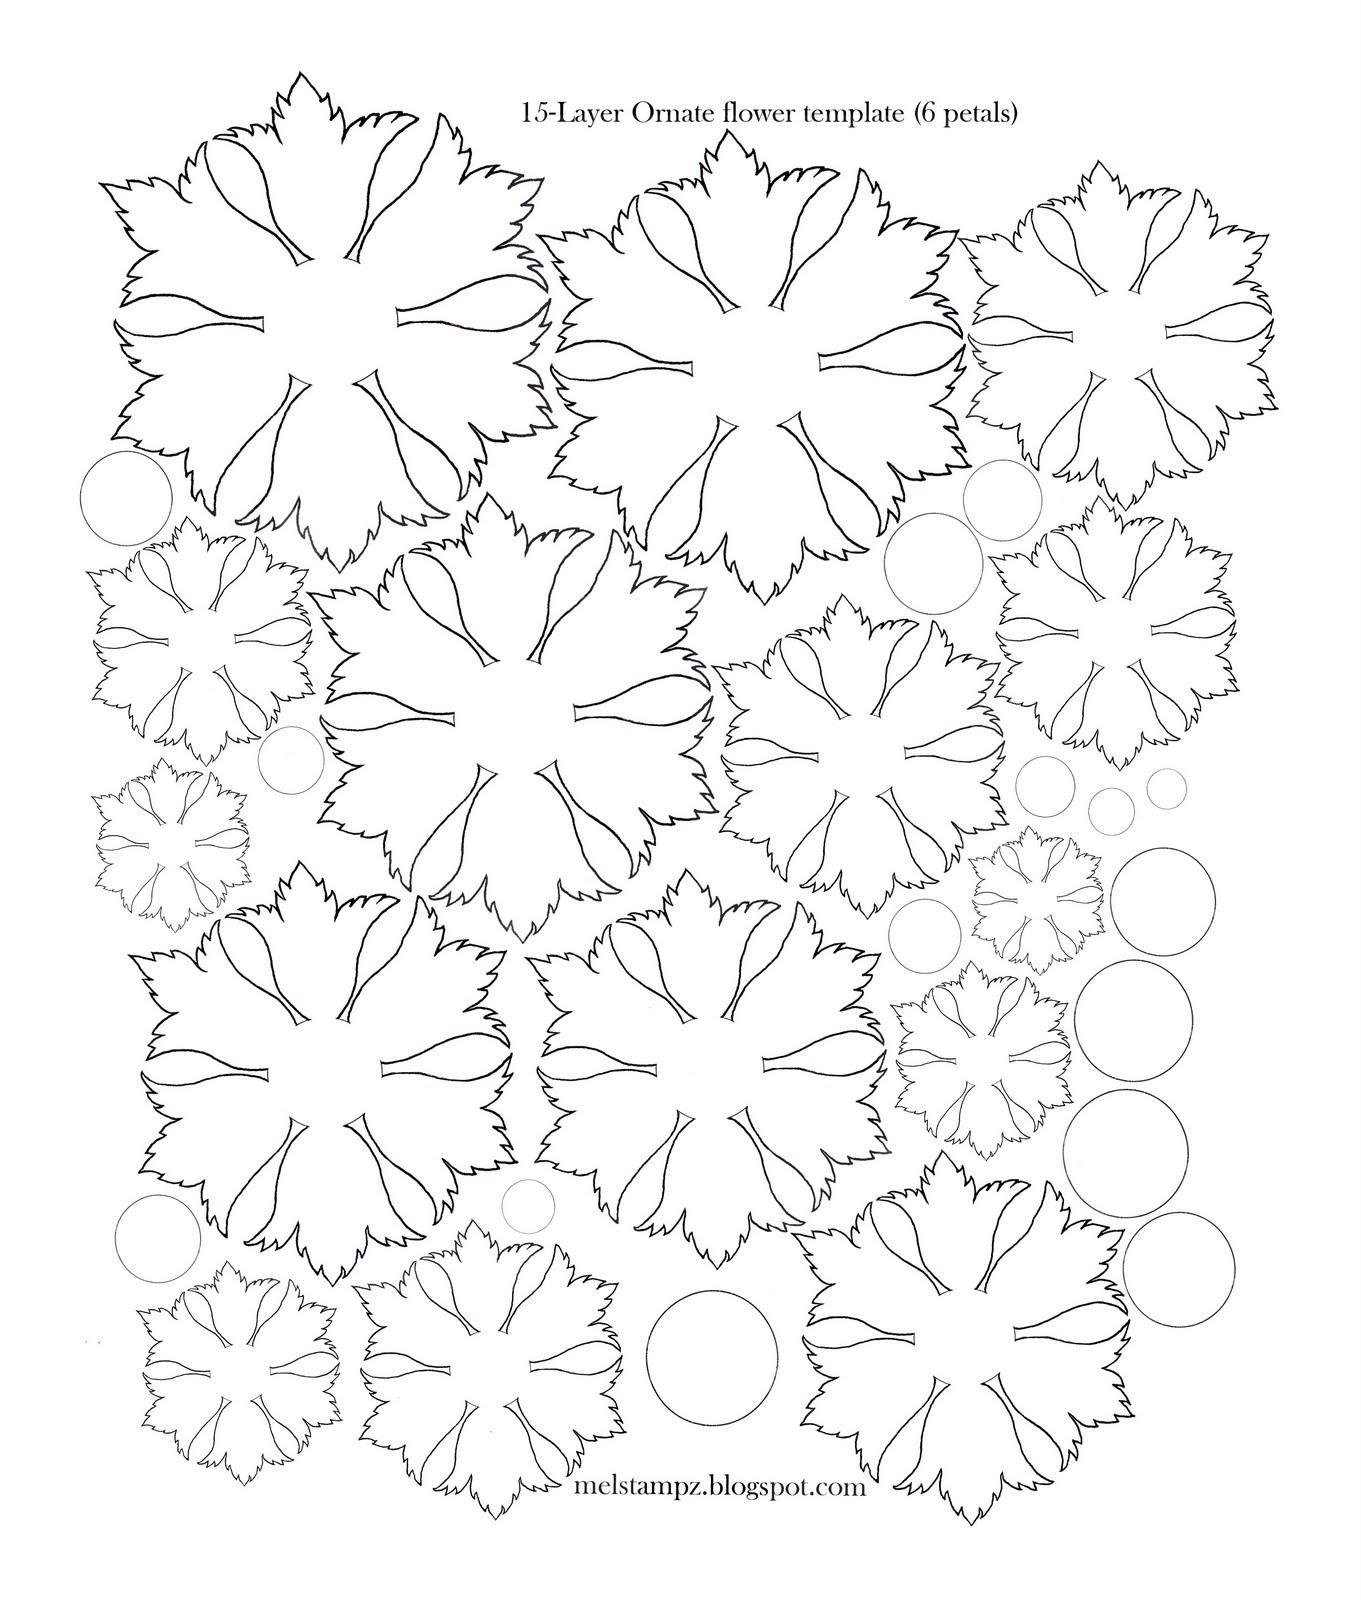 Paper flower petal template pattern ornate flower paper flower templates felt flower 6 petals izmirmasajfo